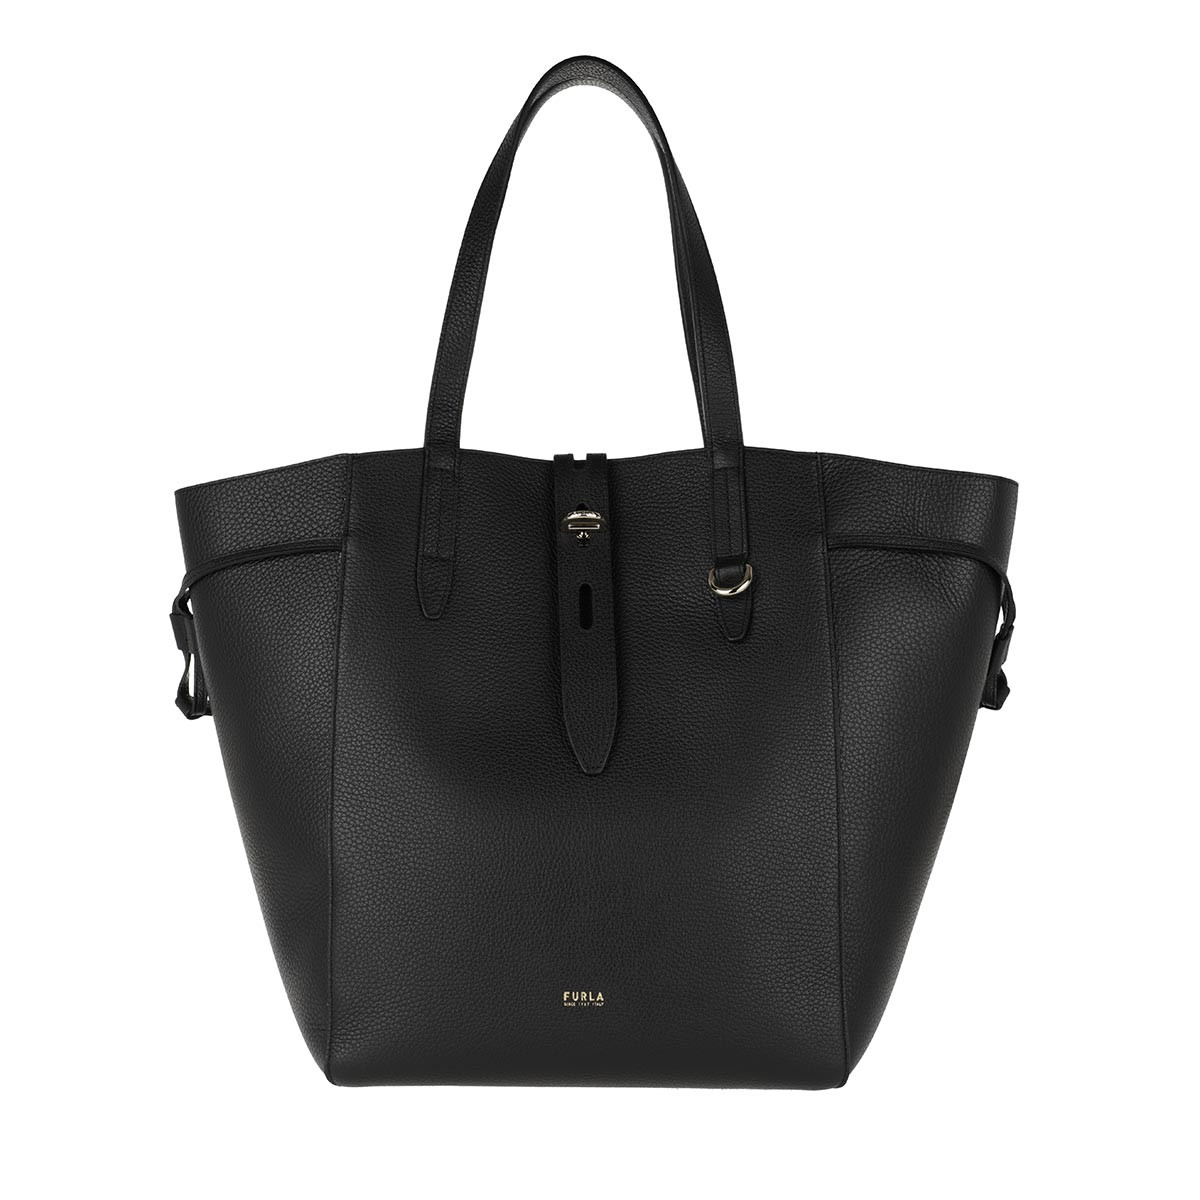 Furla Shopper - Net L Tote Nero - in schwarz - für Damen